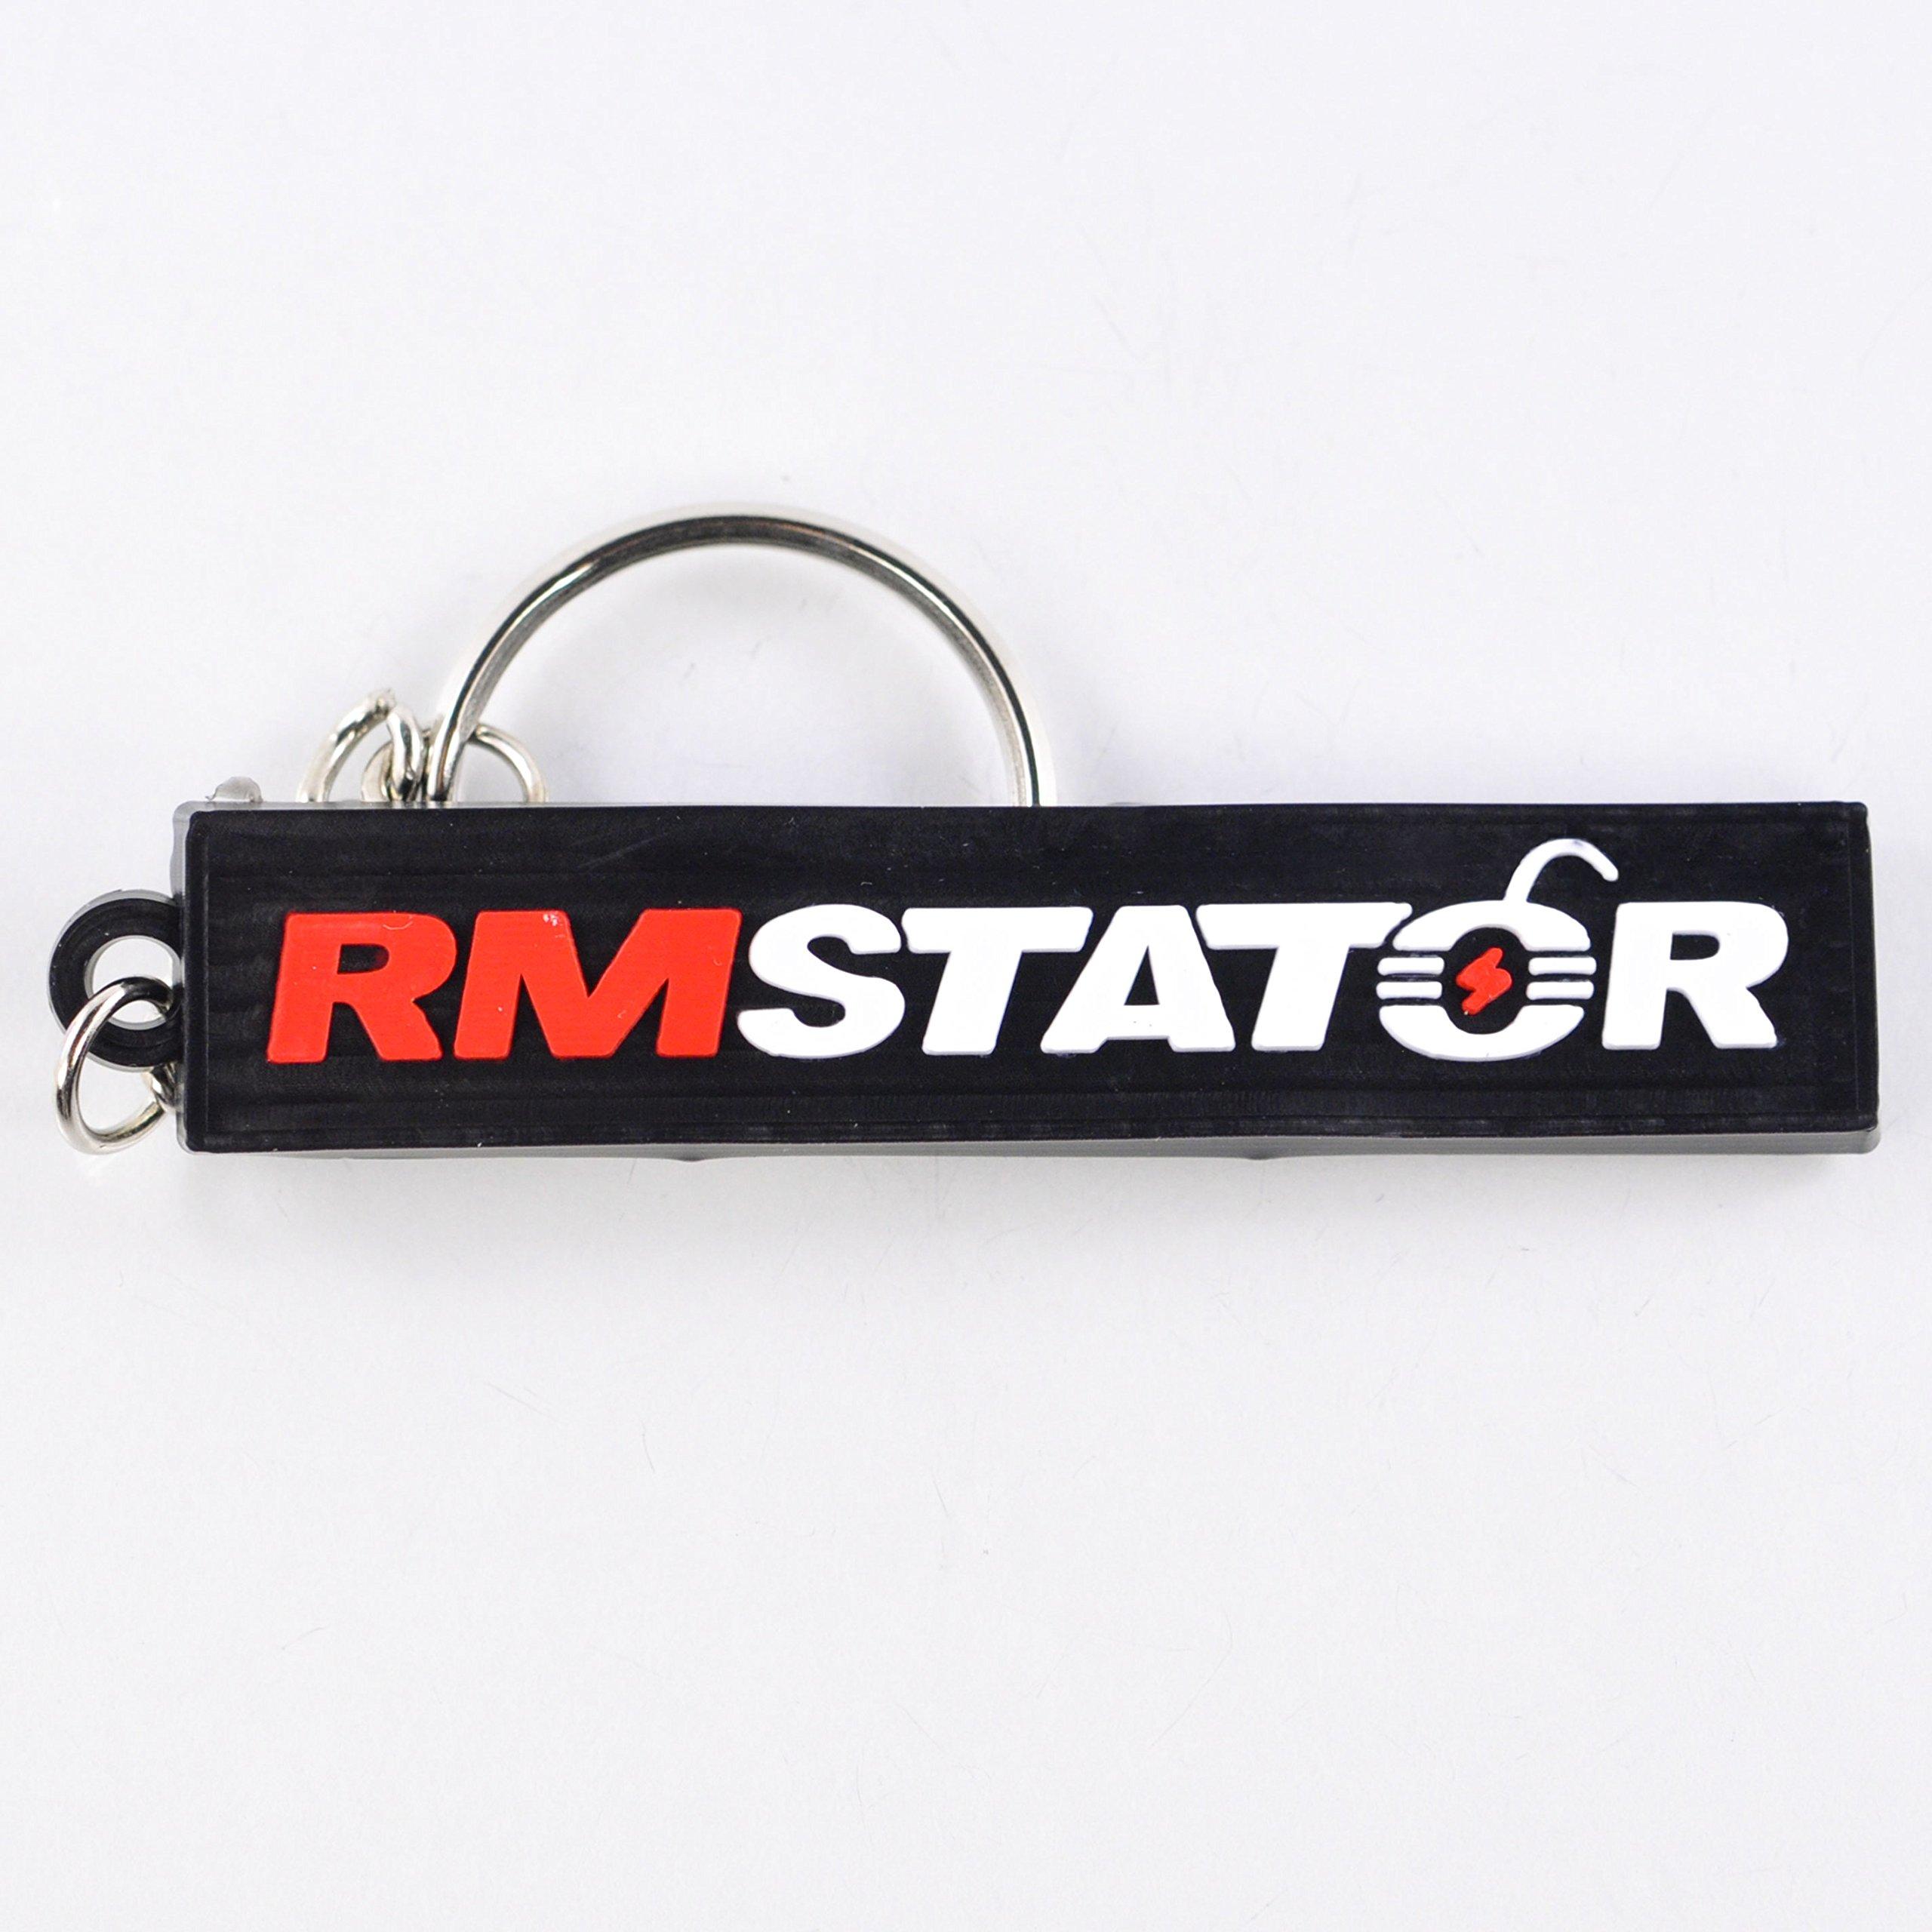 Mosfet Voltage Regulator Rectifier For Polaris RZR 800 Sportsman 800/500 Ranger 500/800 2010 2011 2012 2013 2014 OEM Repl.# 4012748 by RMSTATOR (Image #4)